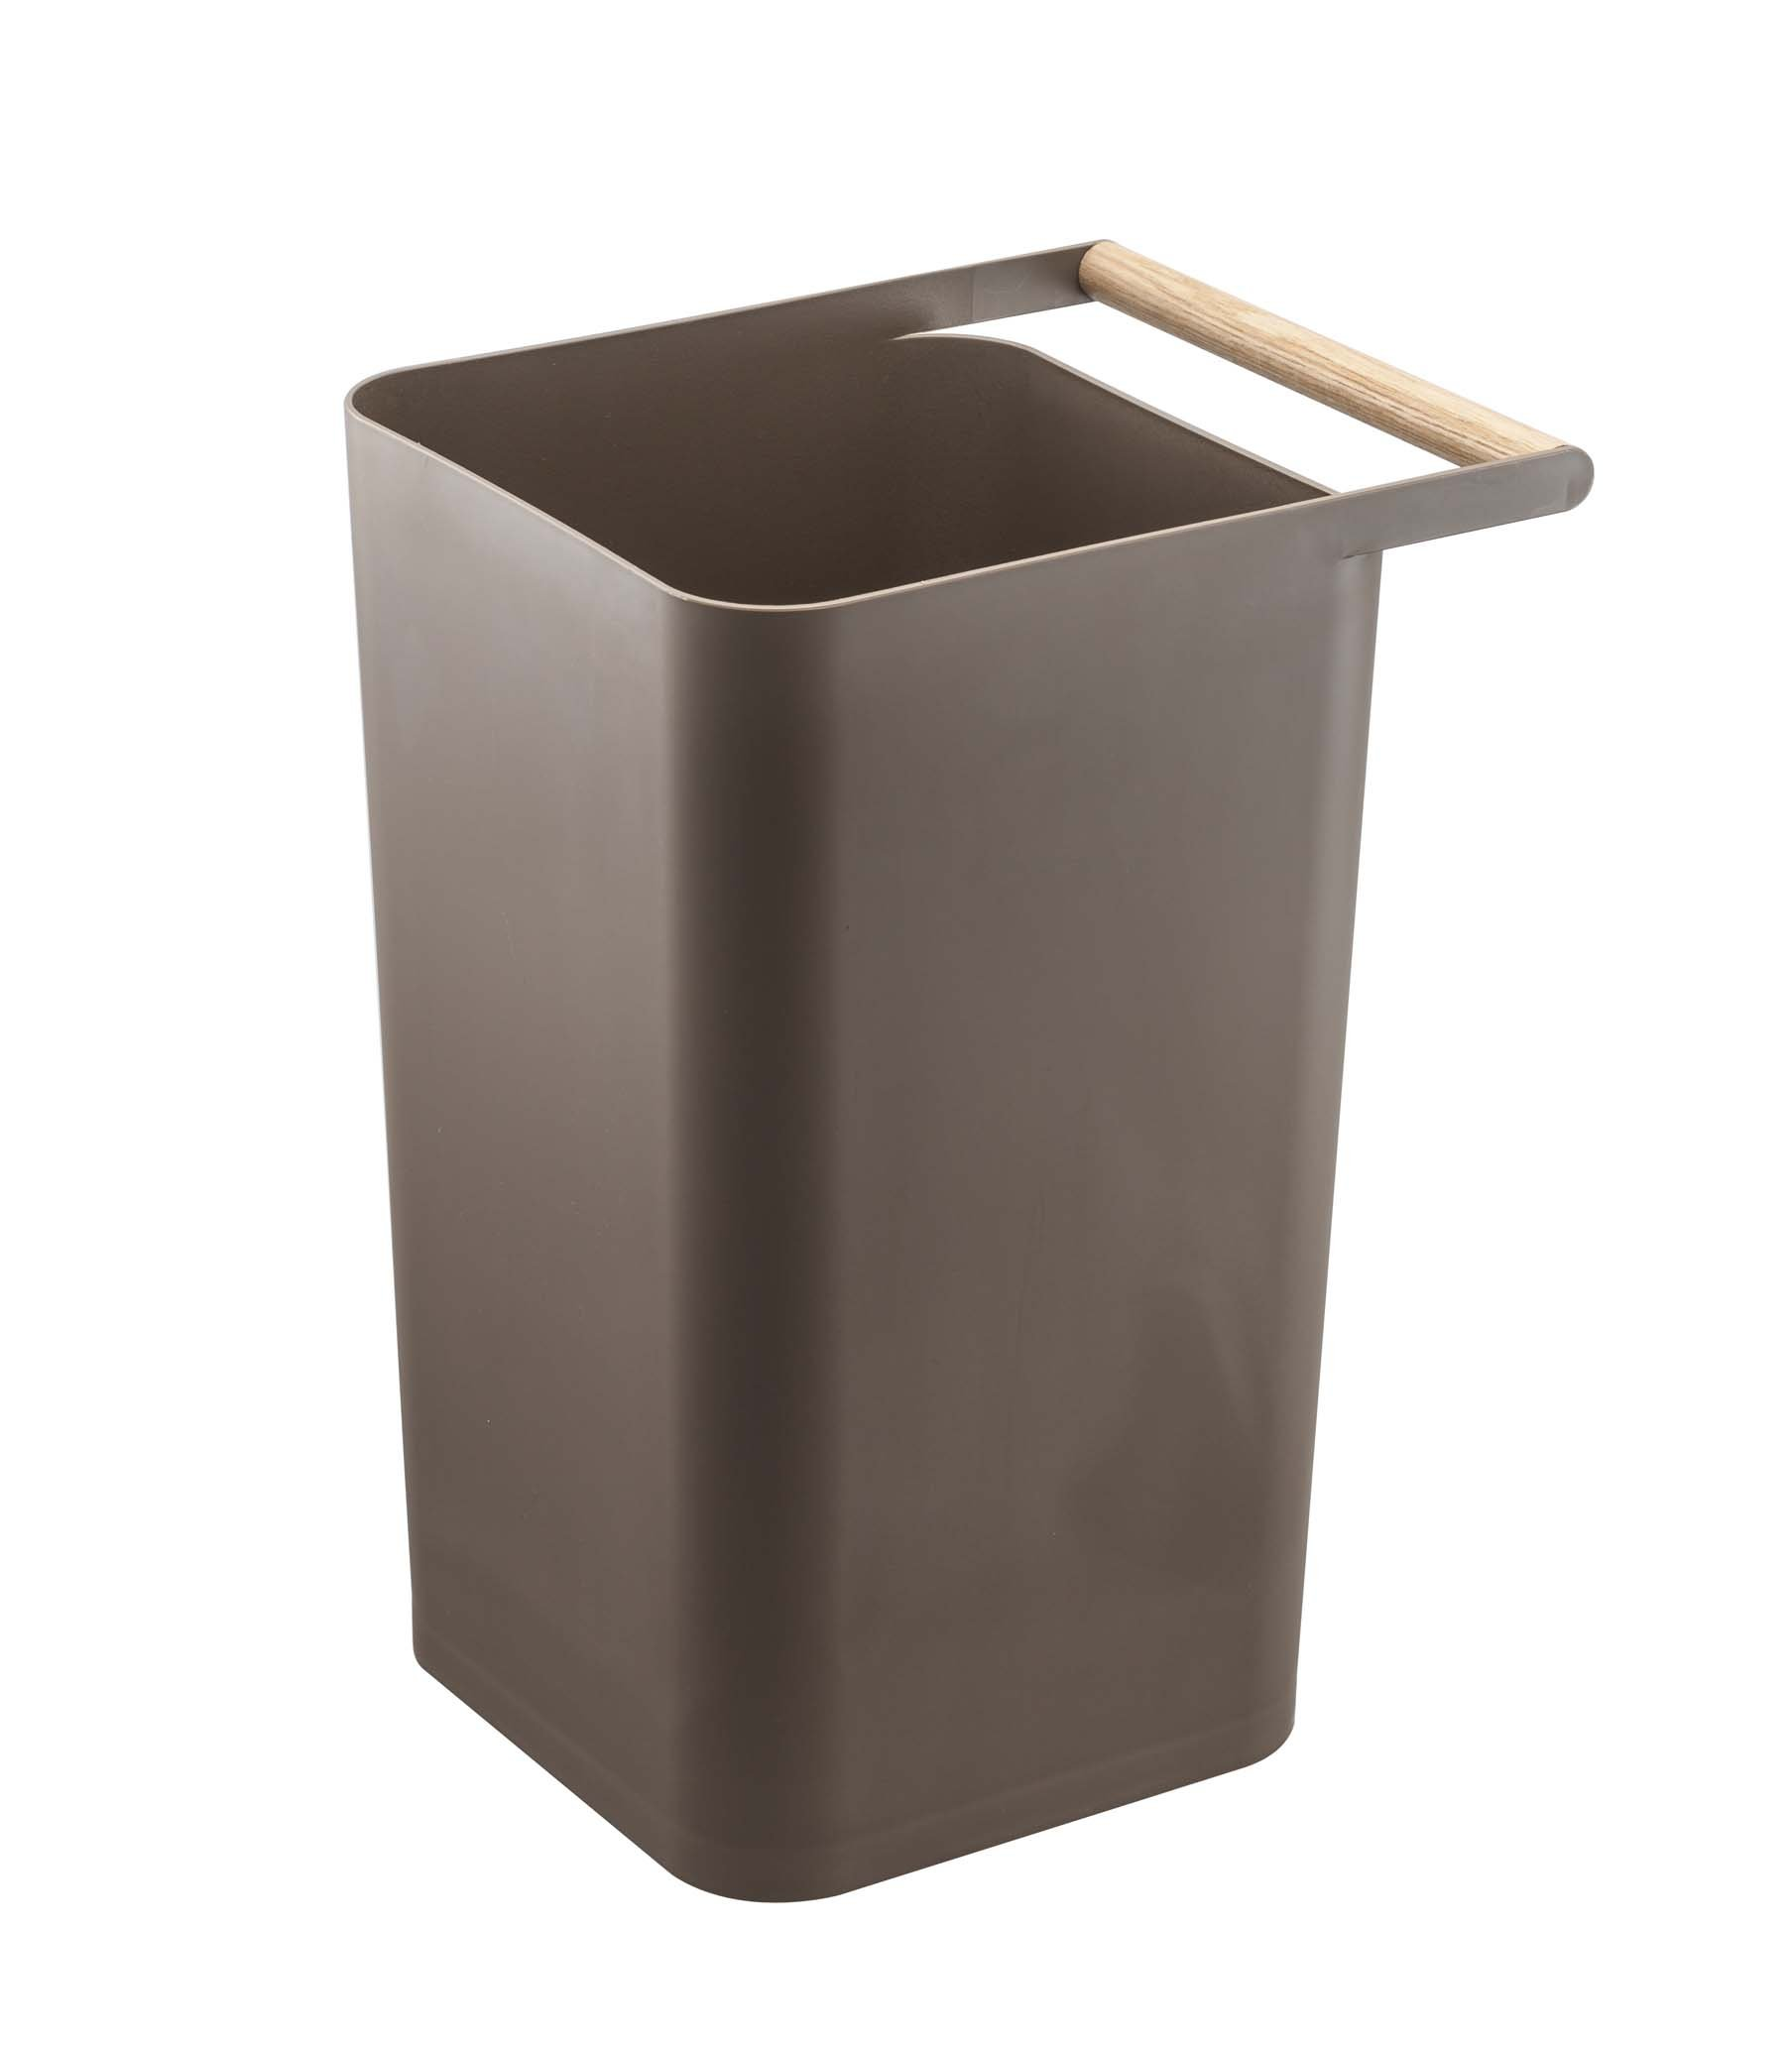 YAMAZAKI home 3135 Como Trash Can, Brown